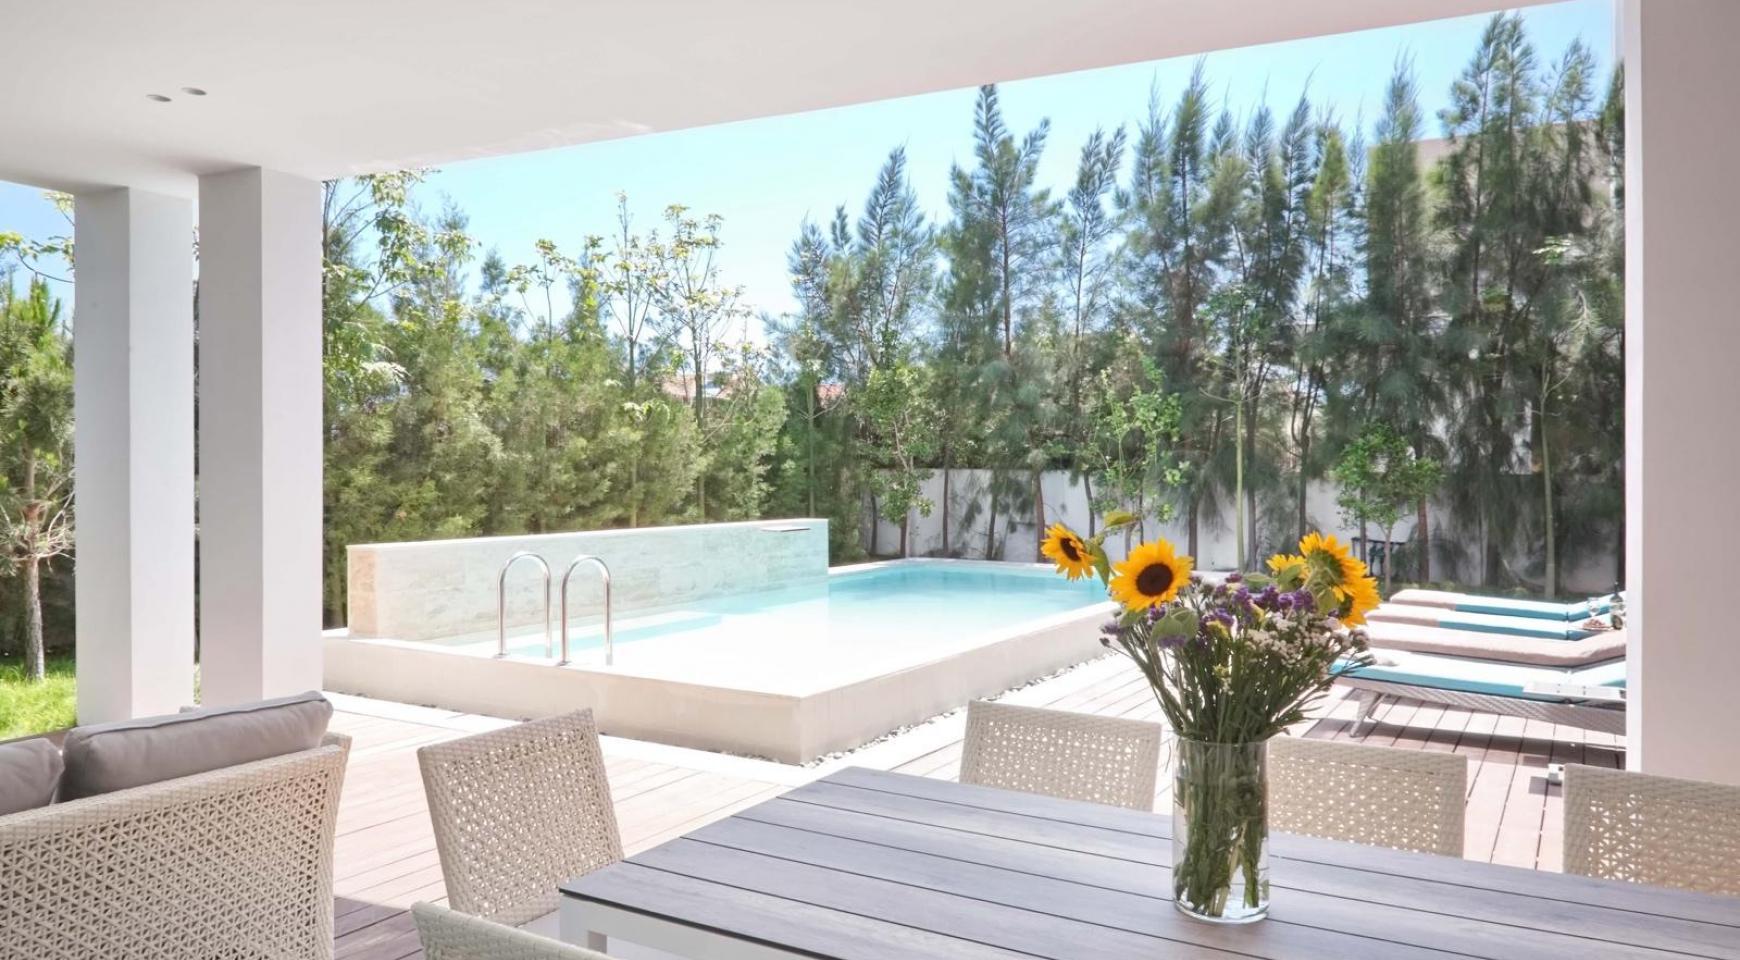 New Luxurious 4 Bedroom Villa in the Tourist Area - 9